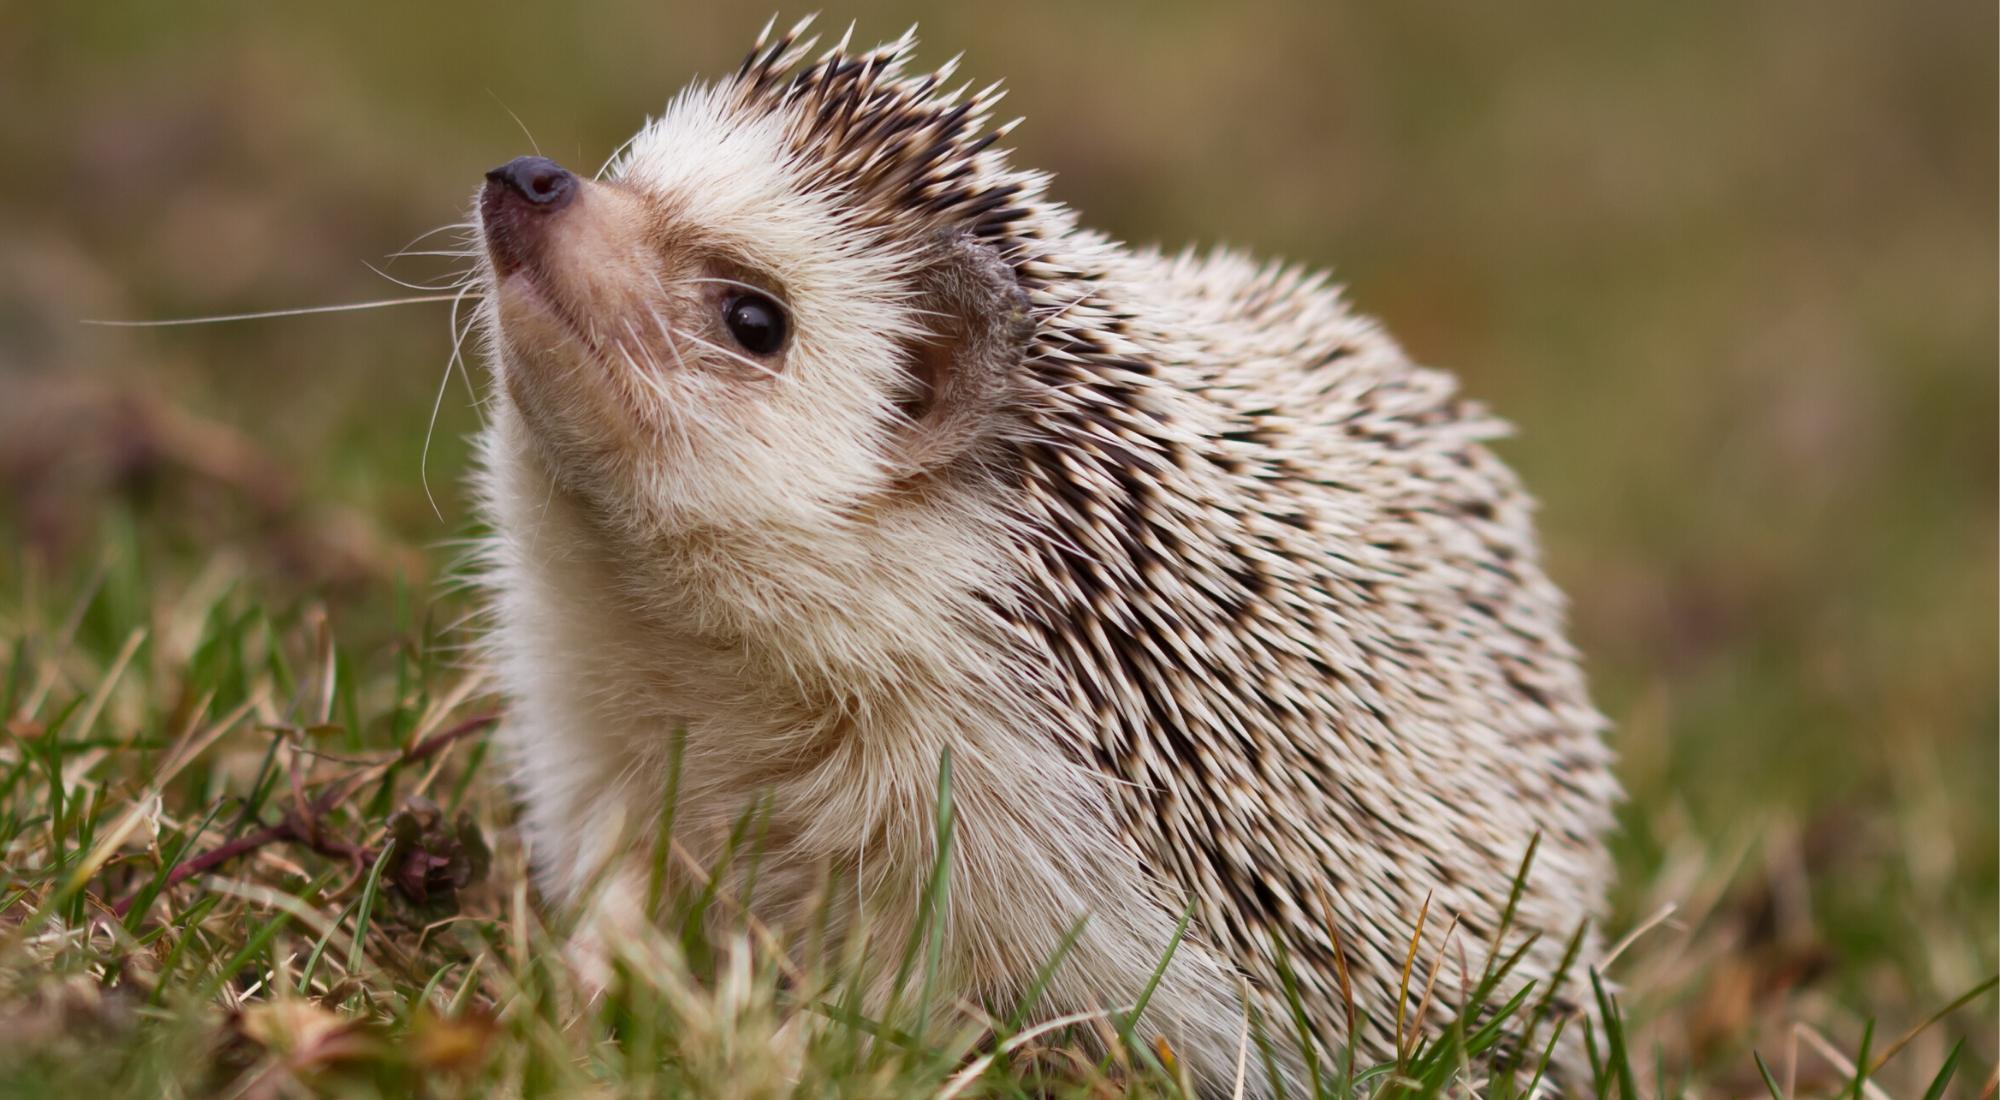 Draw a Hedgehog